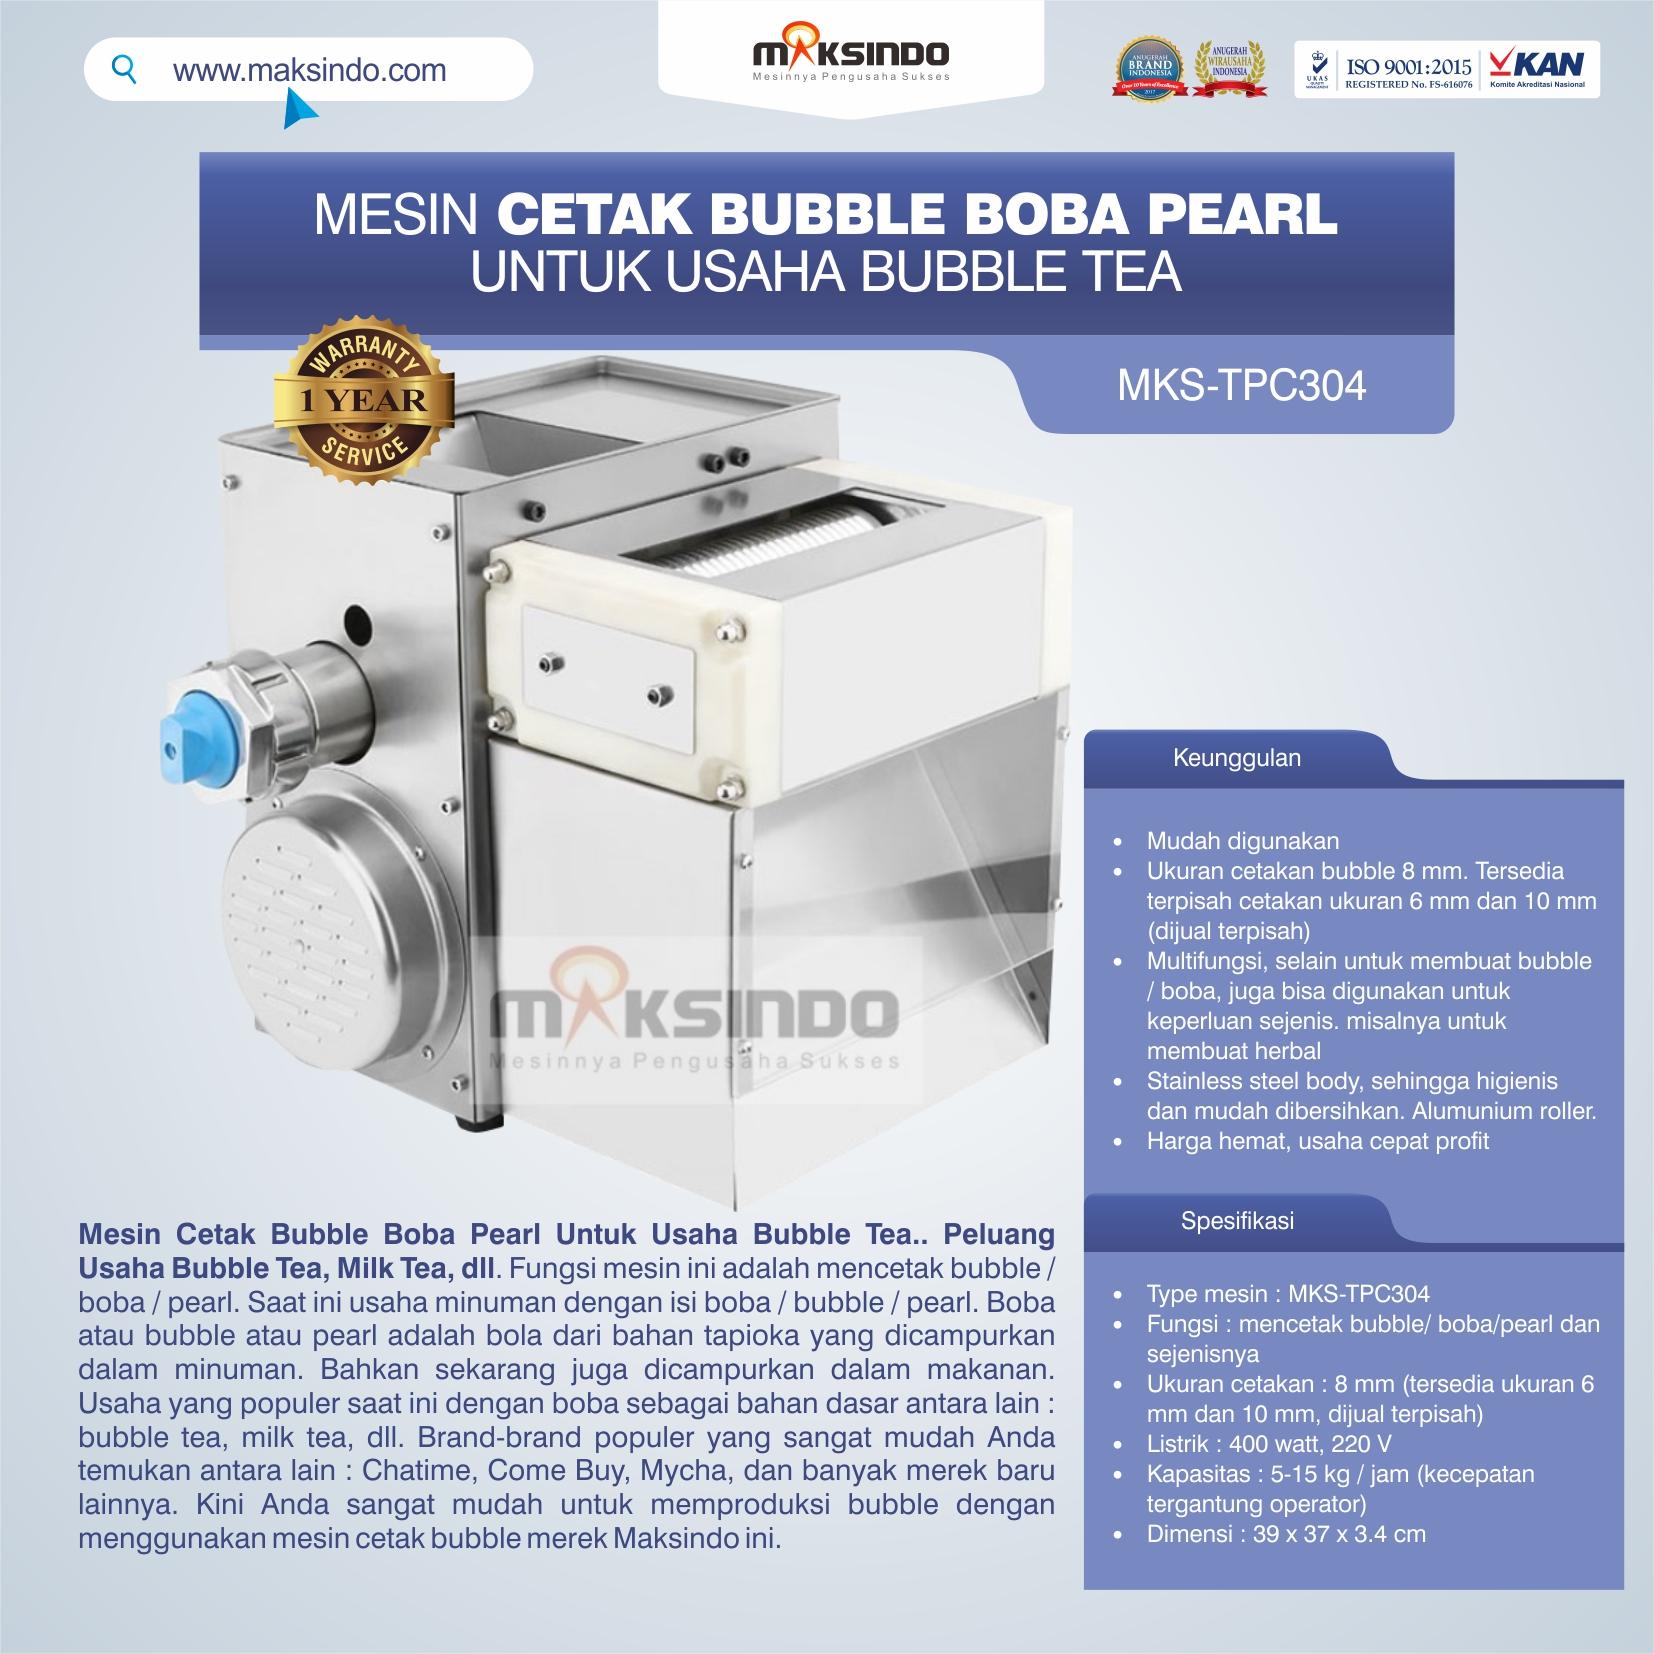 Jual Mesin Cetak Bubble Boba Pearl Untuk Usaha Bubble Tea di Pekanbaru